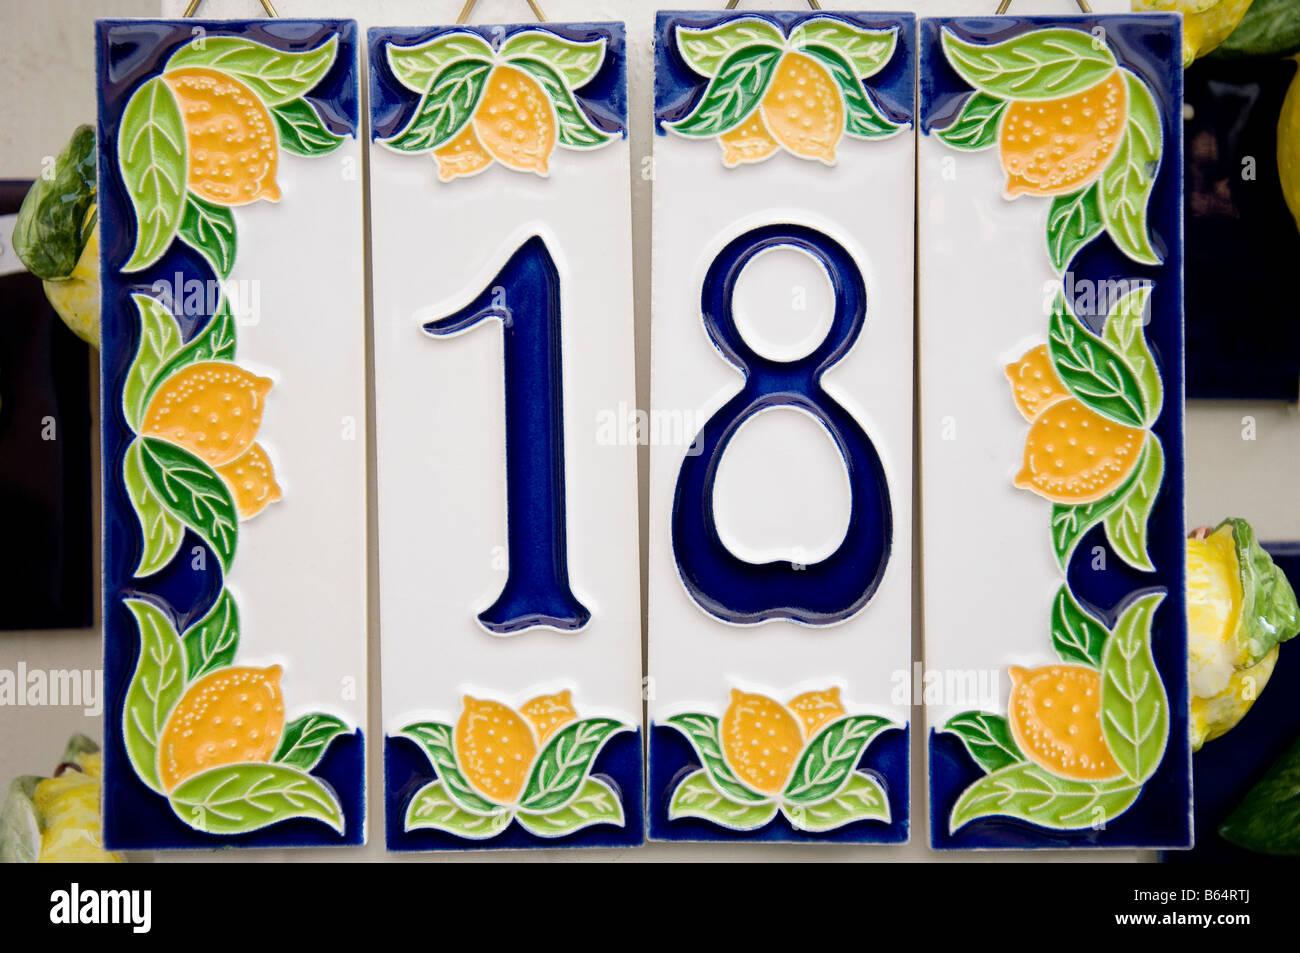 Ceramic house number immagini & ceramic house number fotos stock alamy